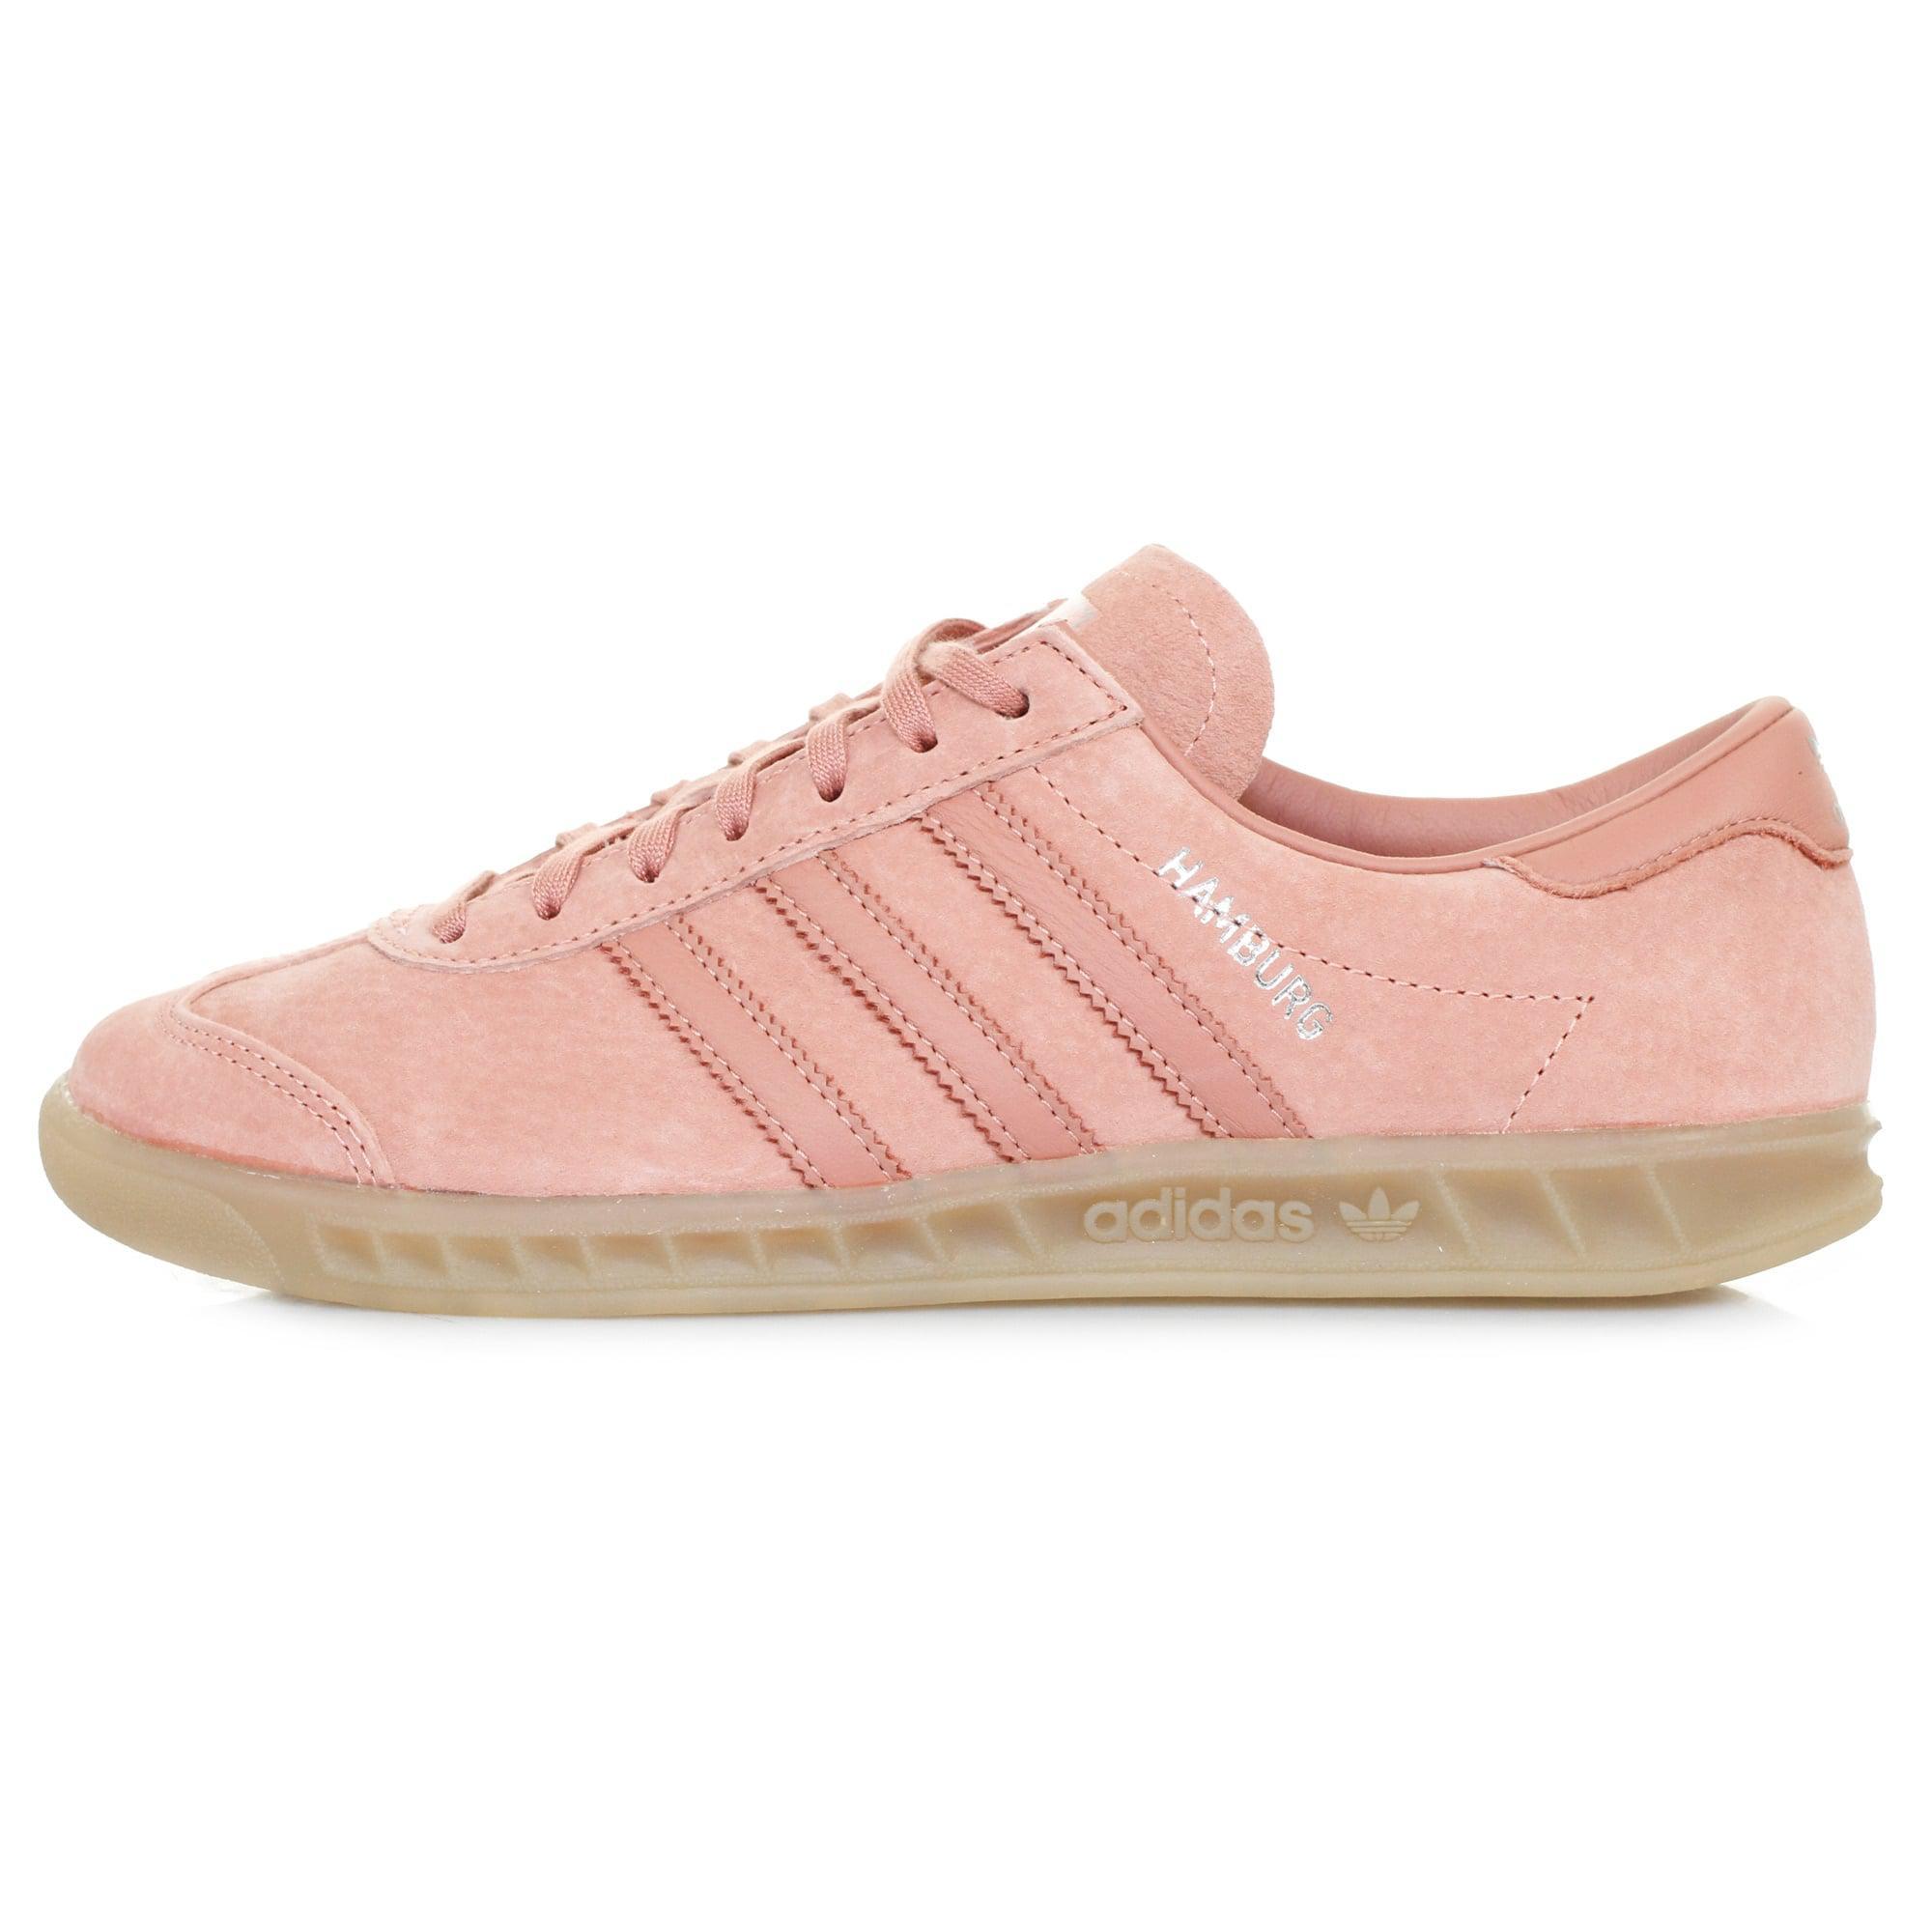 adidas Originals Hamburg Damen Sneaker Schuhe Samba S81825